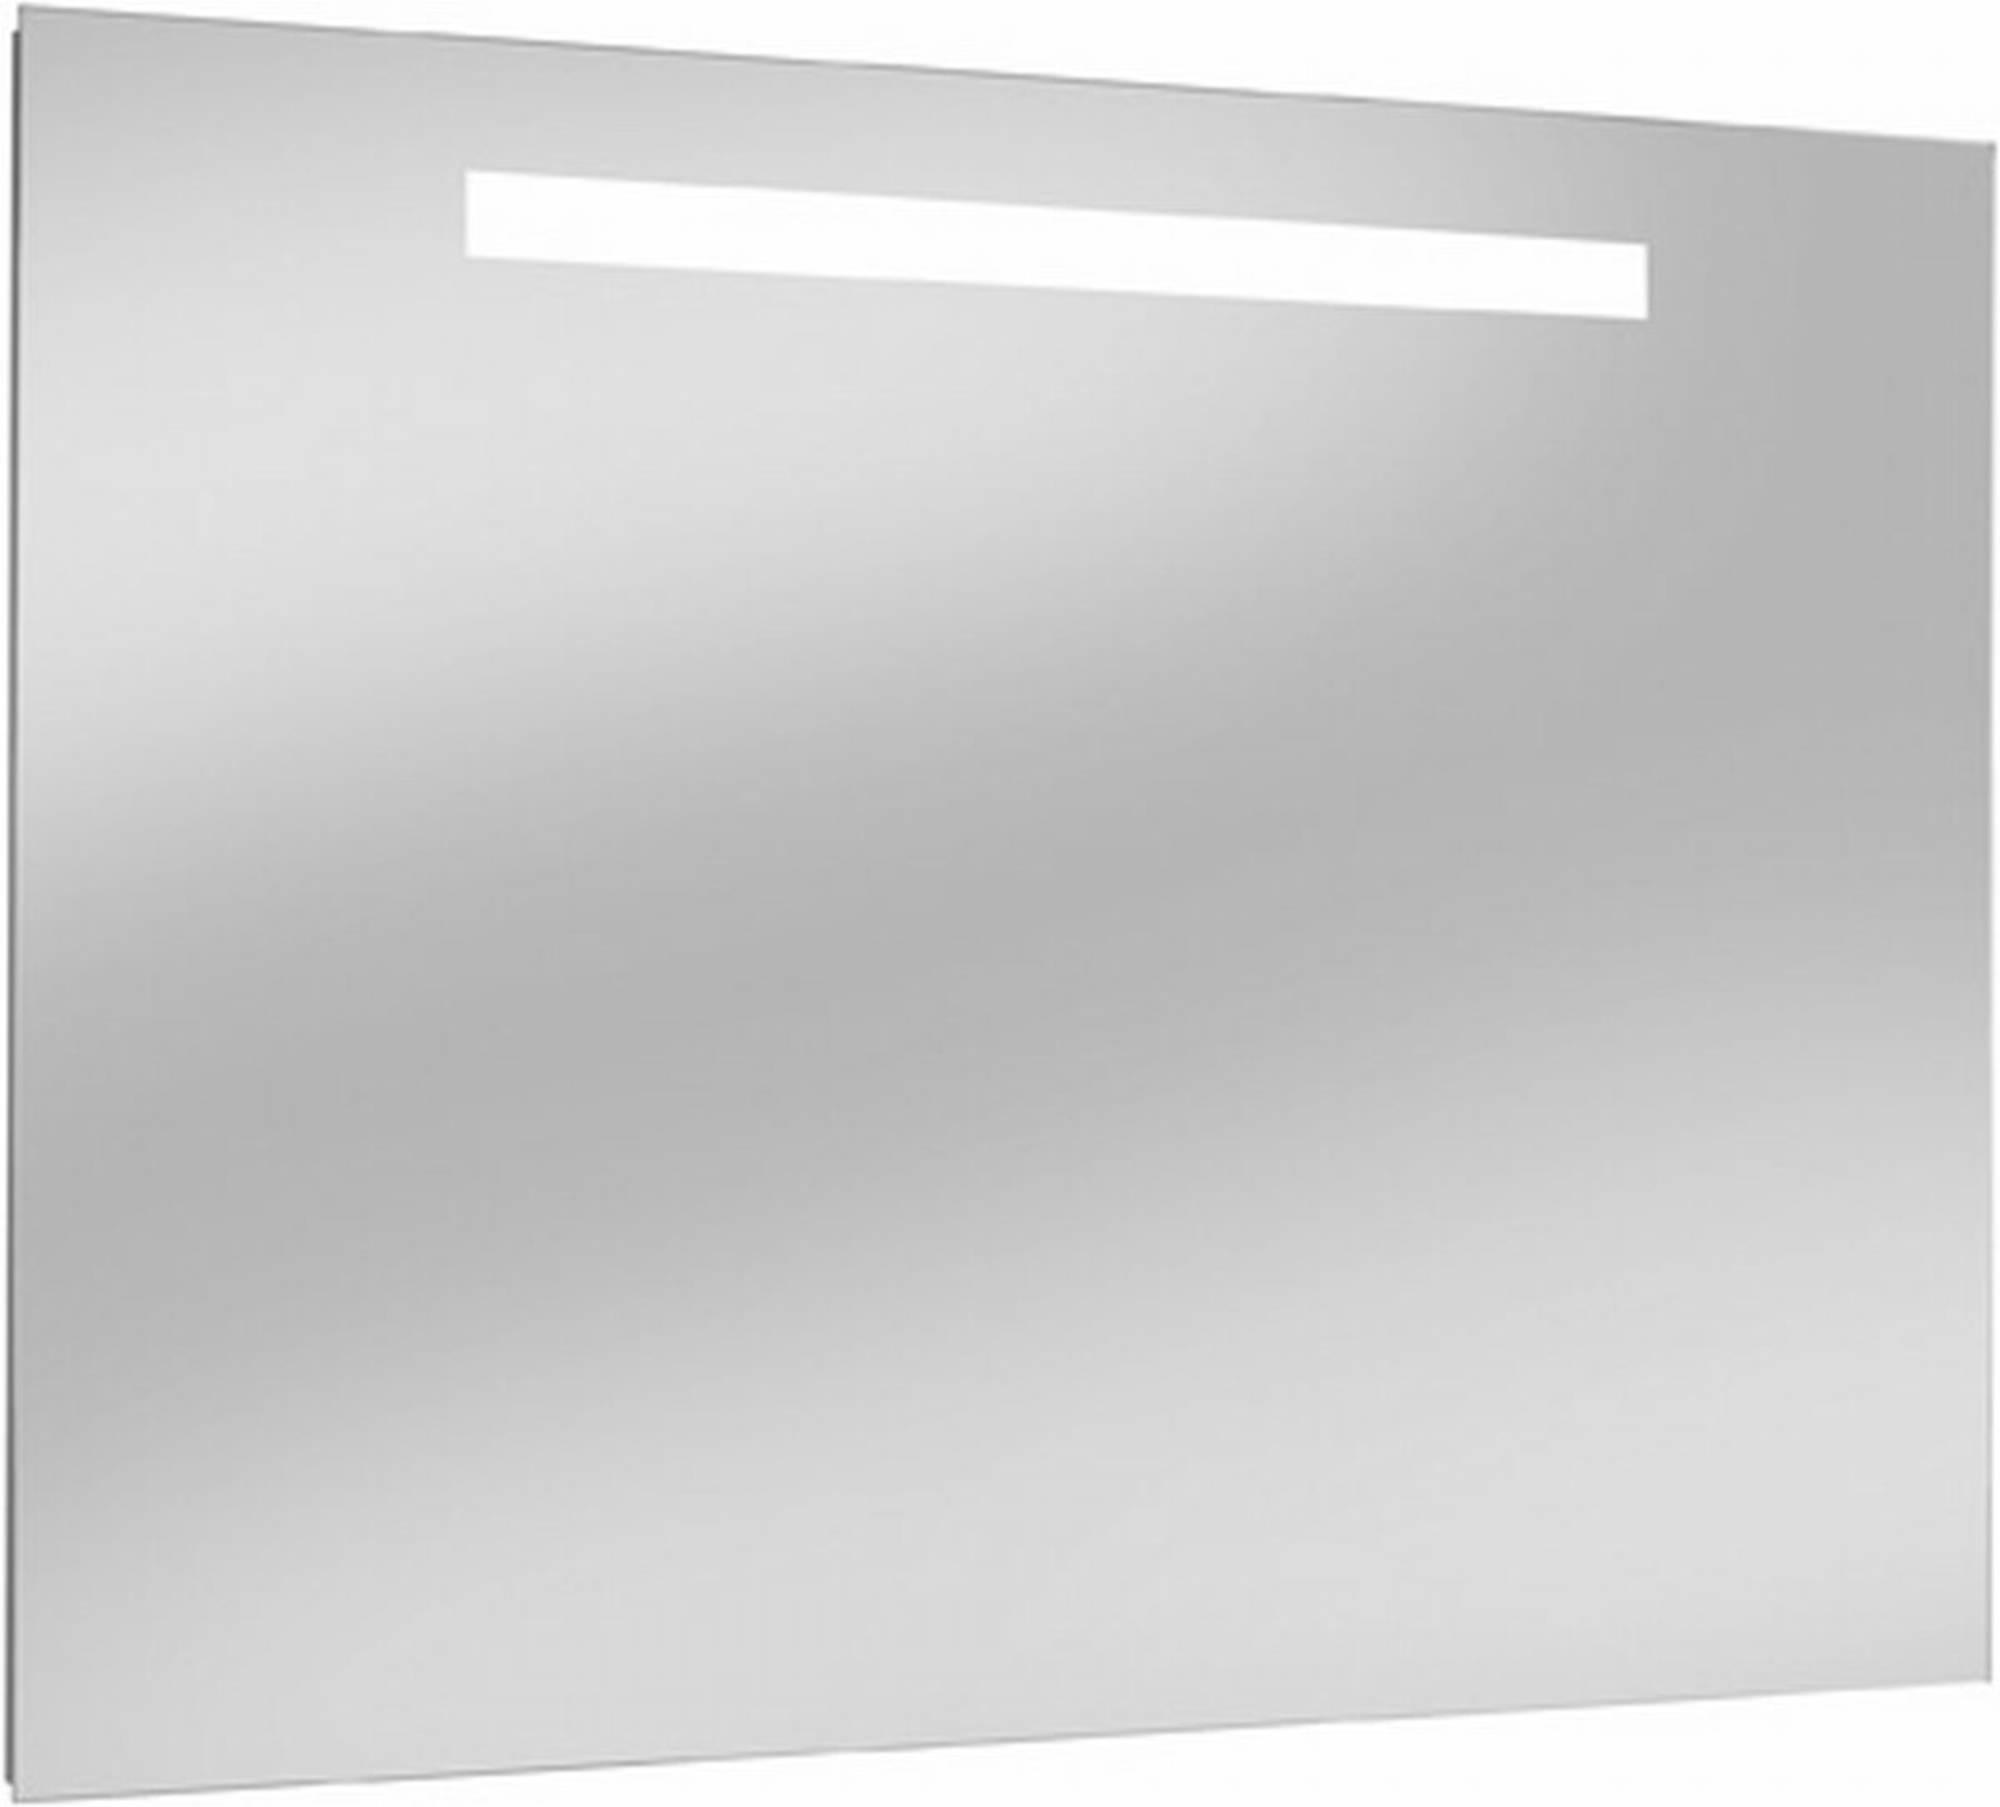 Villeroy&Boch More To See One spiegel 130x60x3 cm met led verlichting